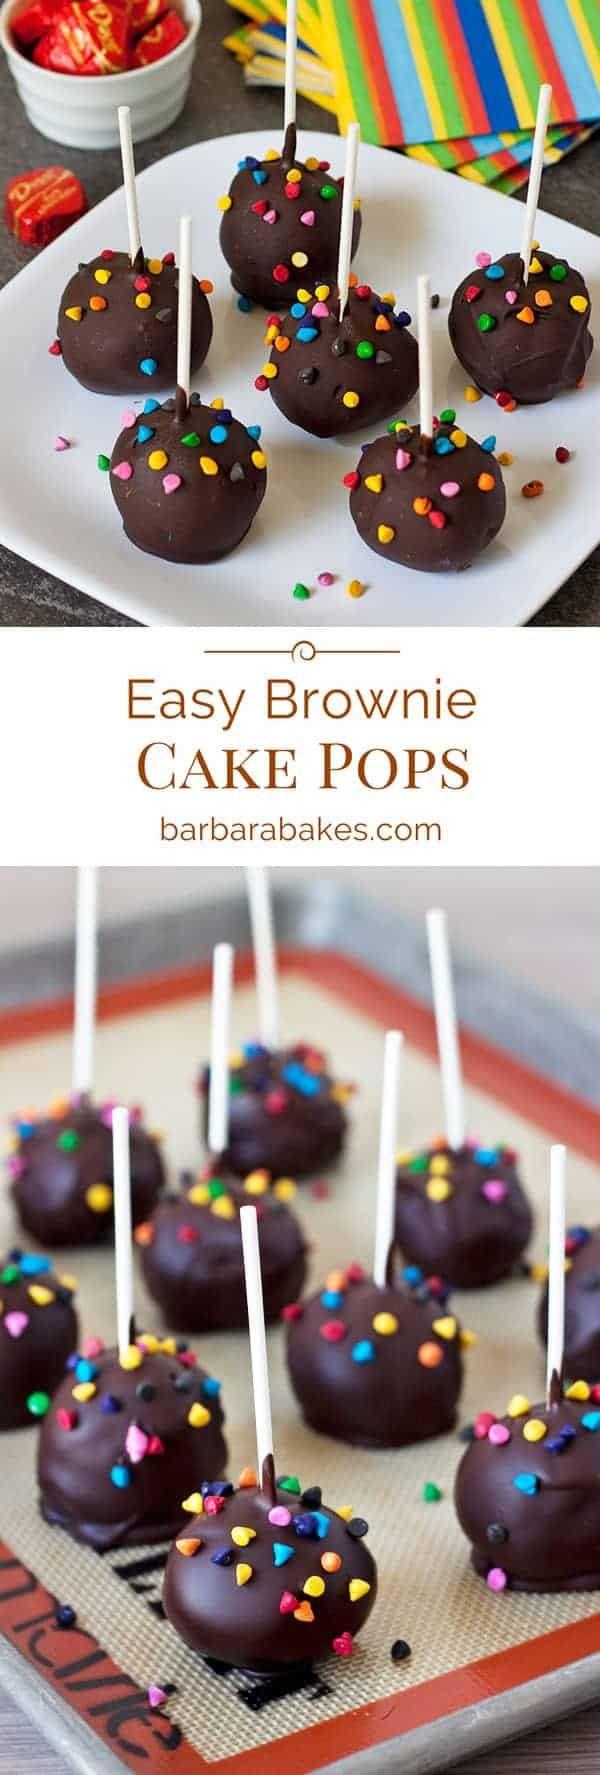 Easy Brownie Cake Pops Recipe from Barbara Bakes